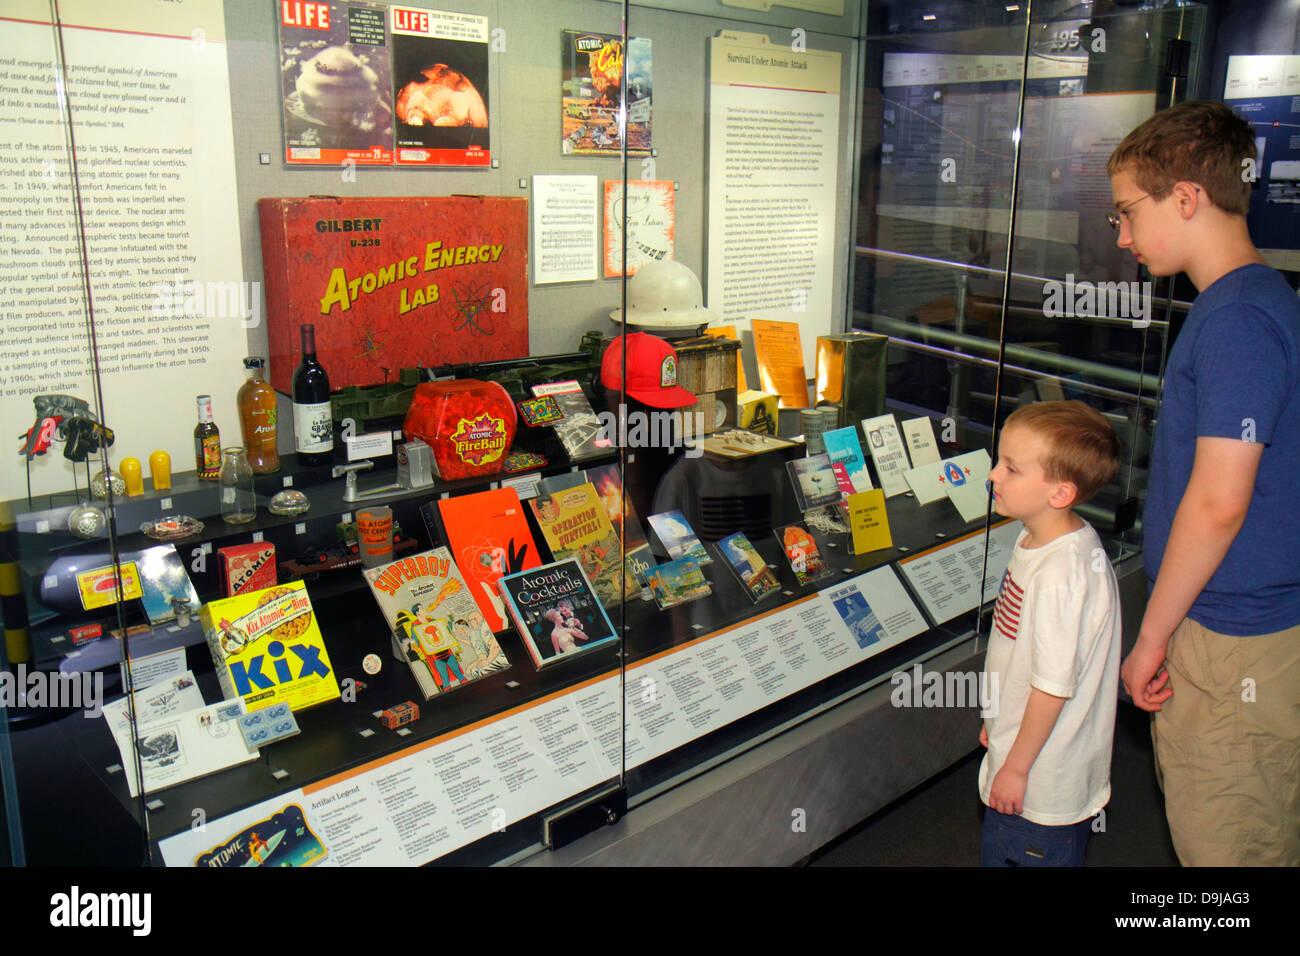 Nevada Las Vegas Flamingo Road National Atomic Testing Museum nuclear weapons development Area 51 relics boy teen Stock Photo